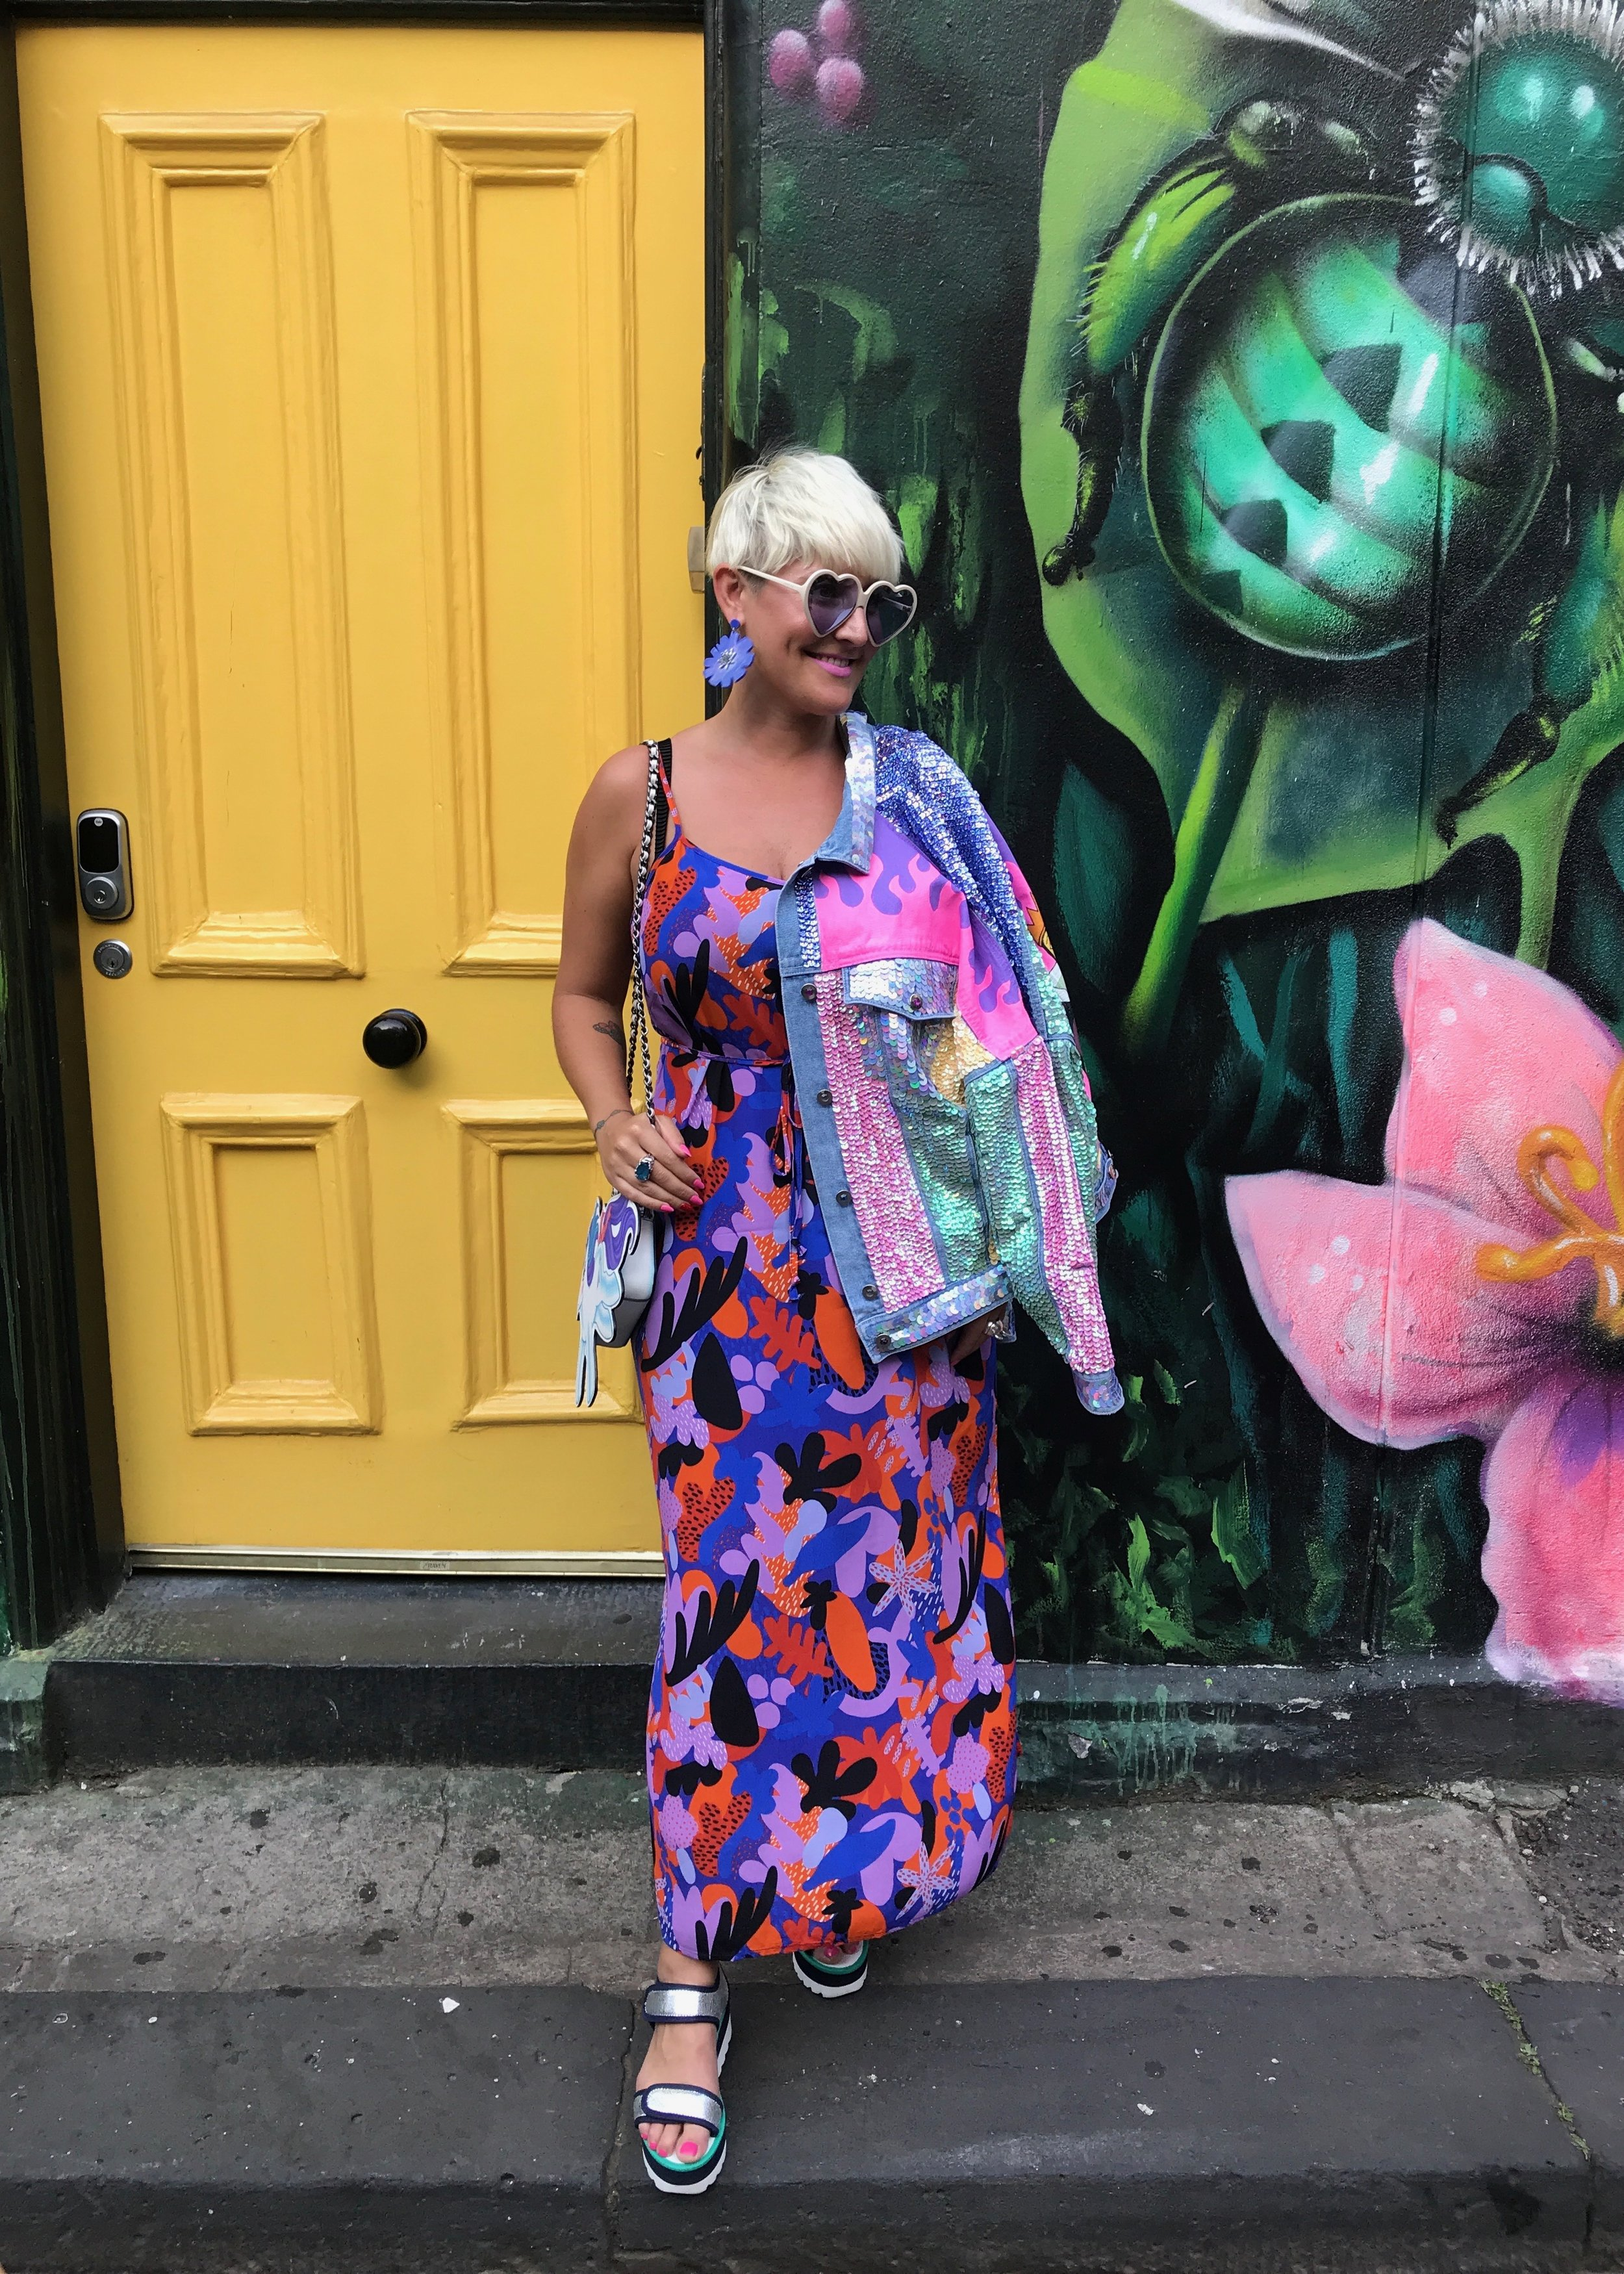 Hilsz with her new sequin denim jacket by Tar Mafia